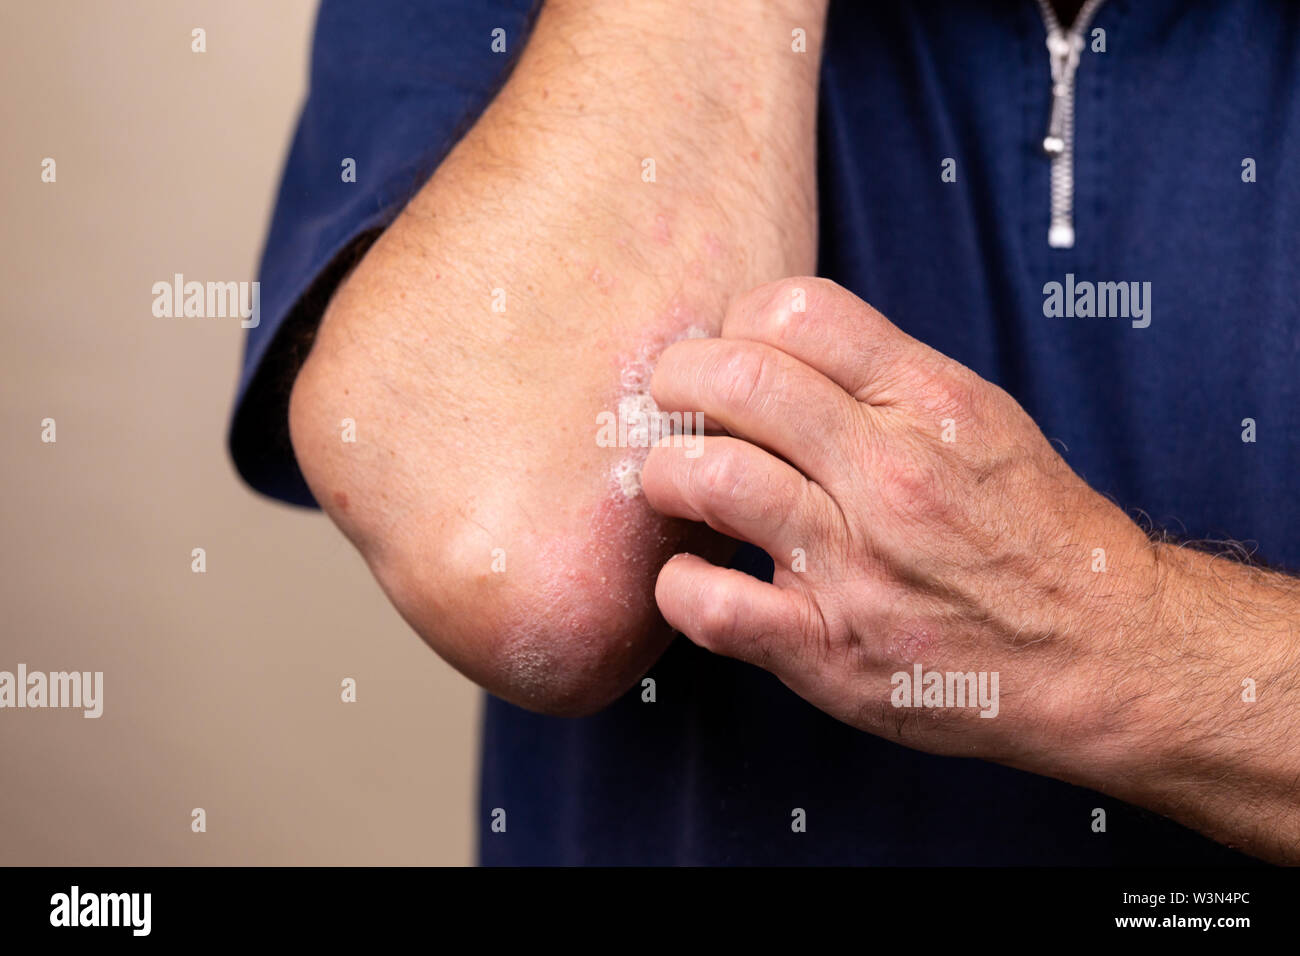 Close up dermatitis on skin, ill allergic rash dermatitis eczema of patient , atopic dermatitis symptom skin detail texture , Fungus The concept derma - Stock Image